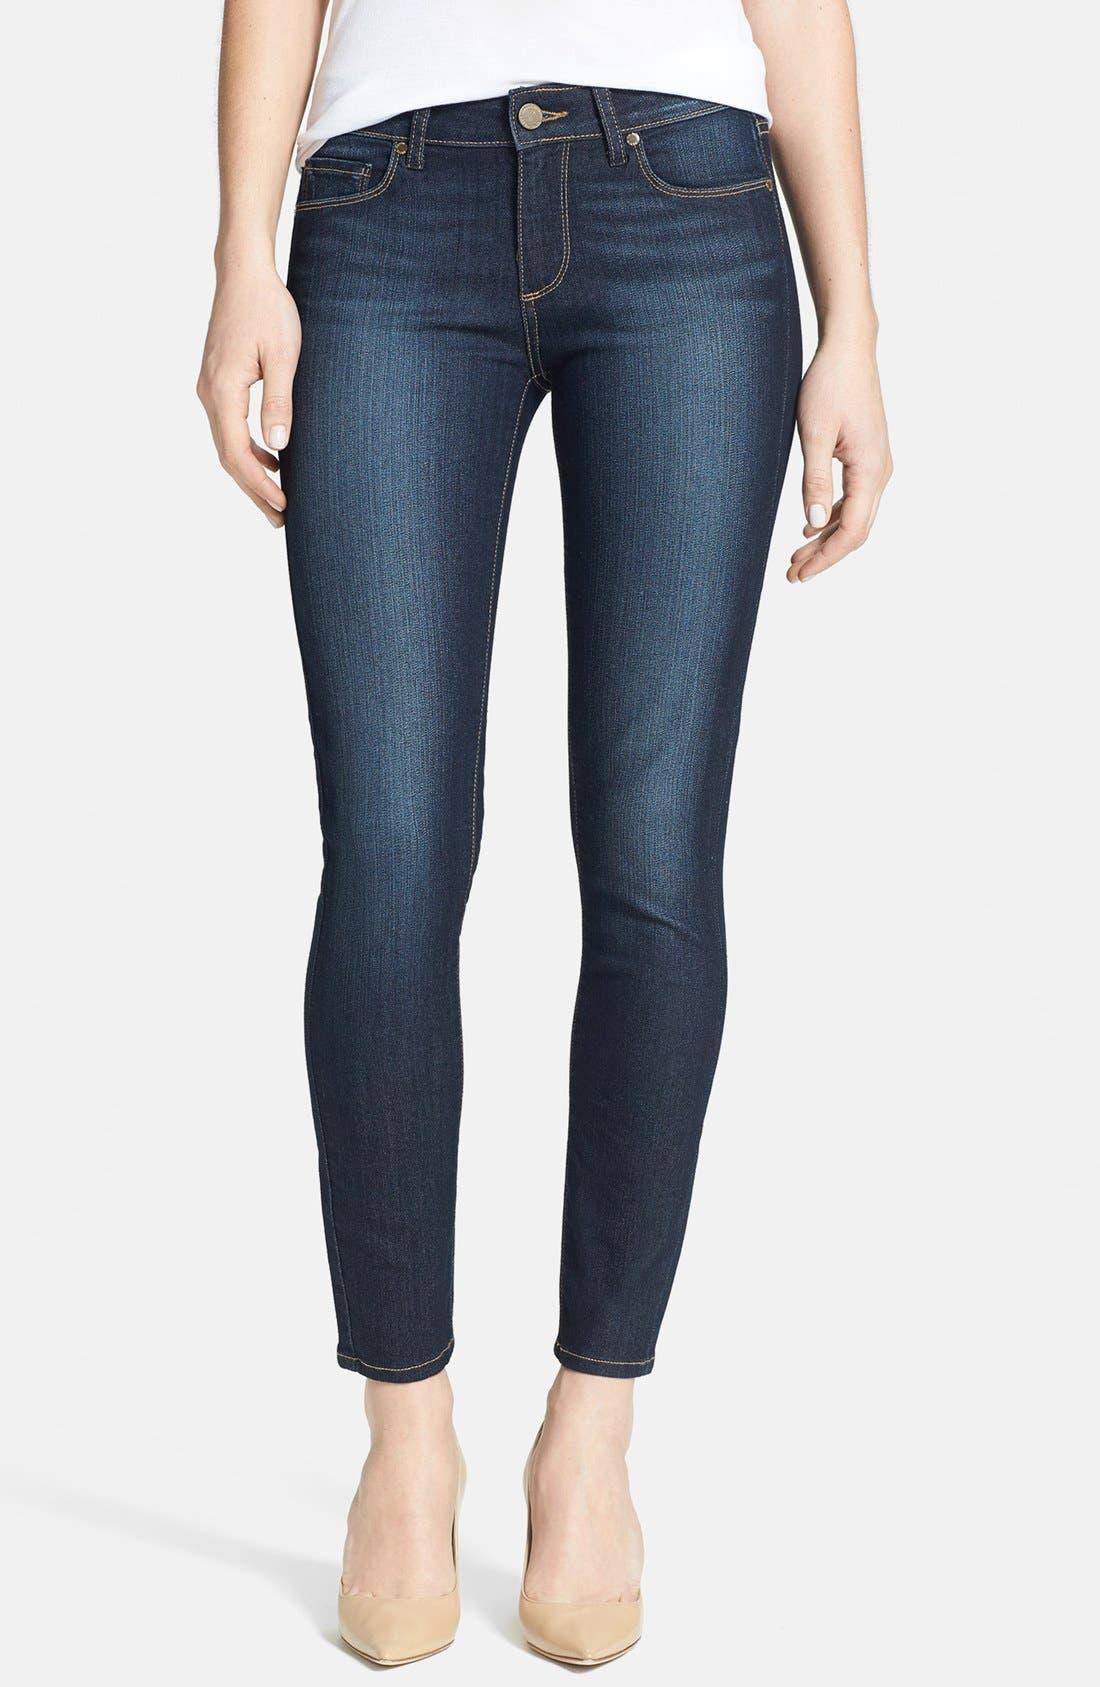 Alternate Image 1 Selected - Paige Denim 'Verdugo' Skinny Ankle Jeans (Moonrise)